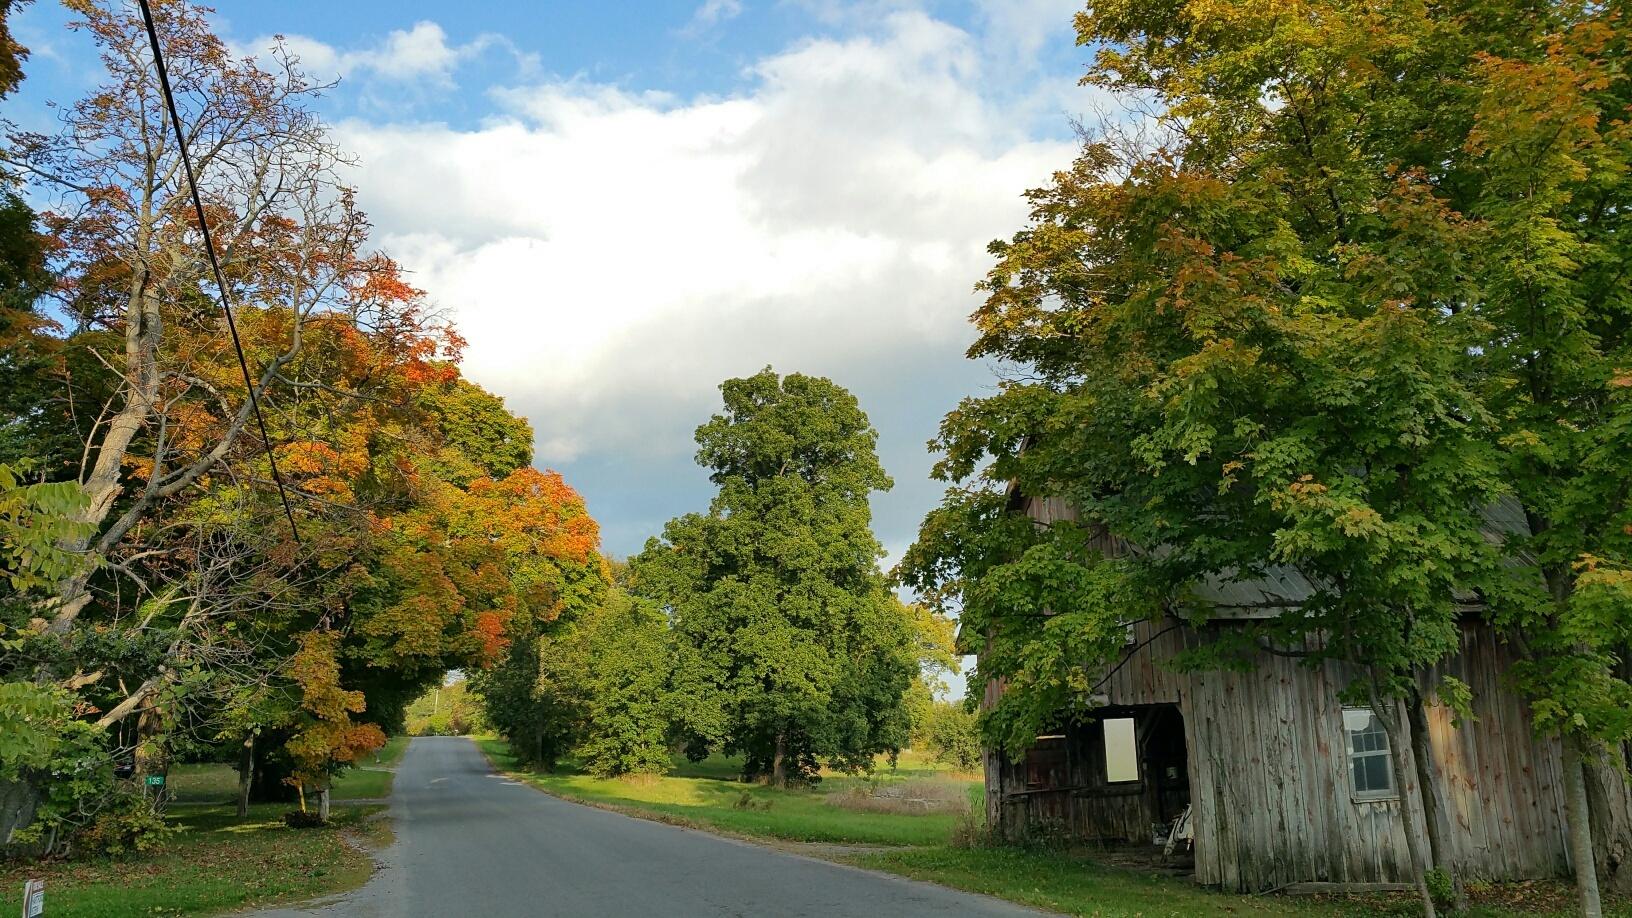 Early Fall colour